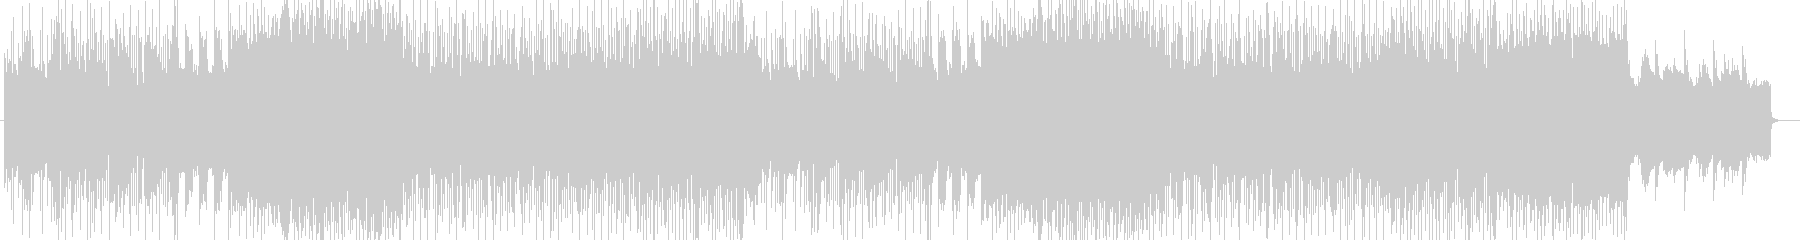 「HR/HM」「DARK」BGM132の未再生の波形